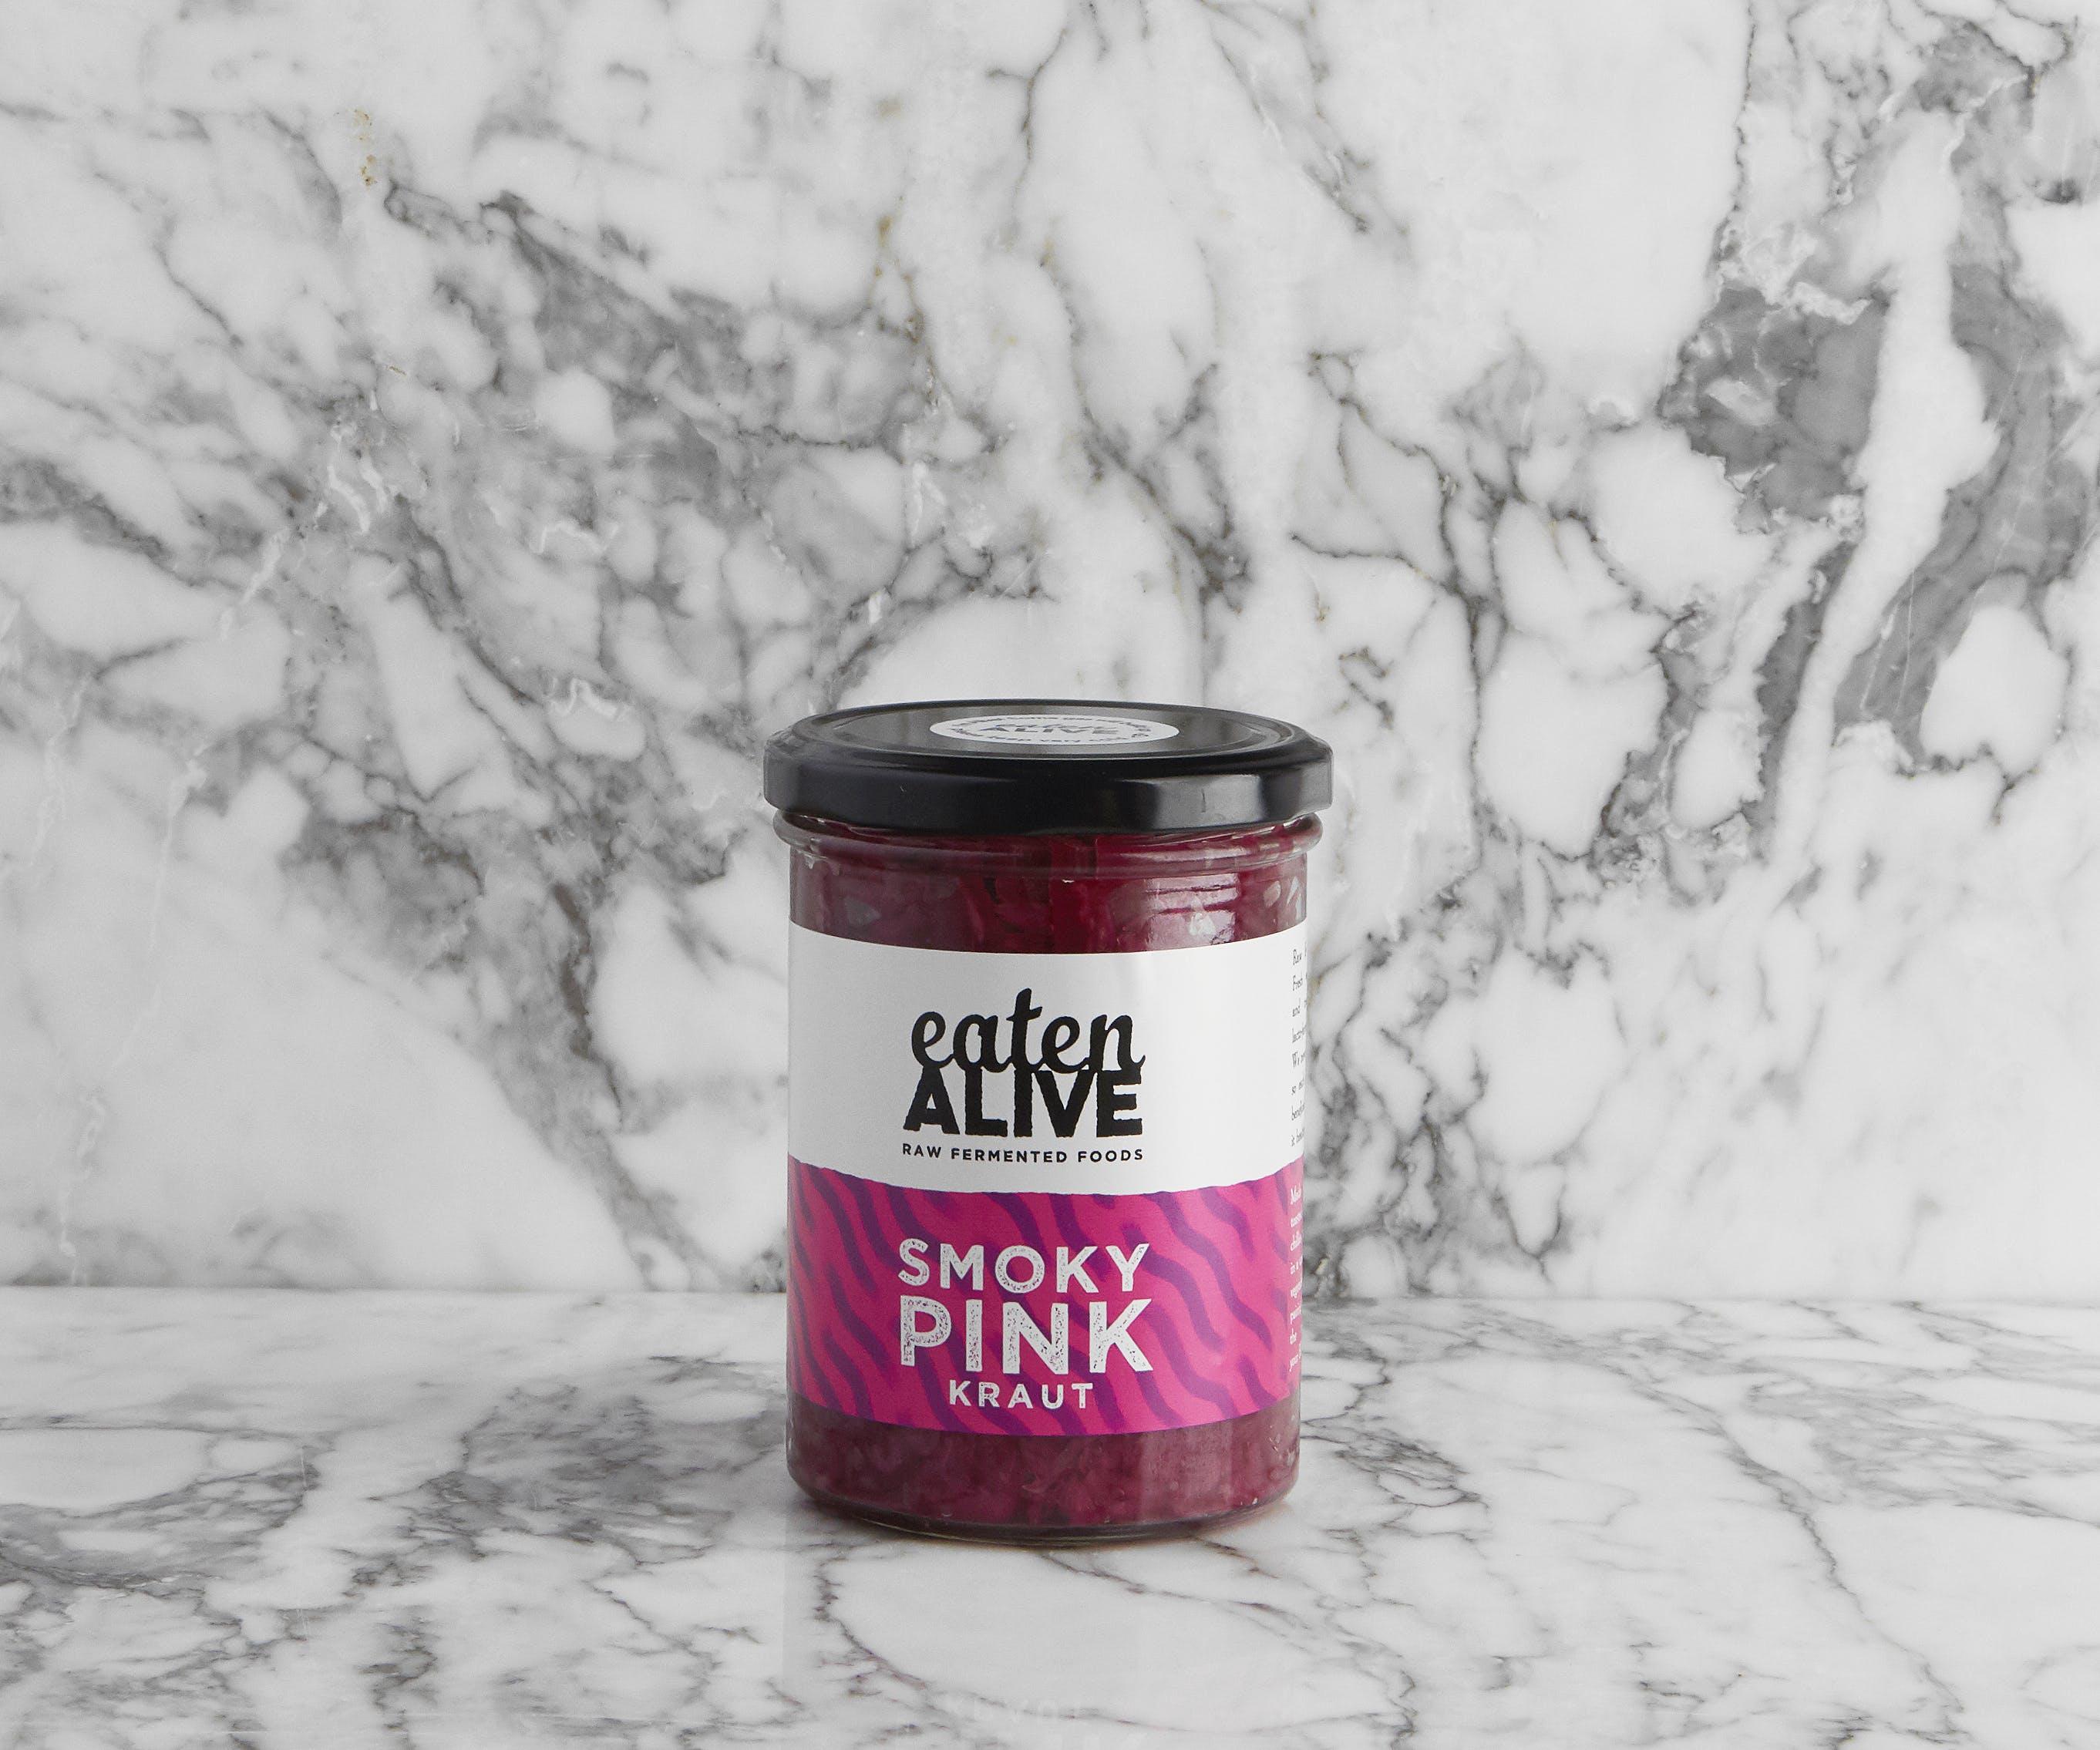 Smoky Pink Kraut